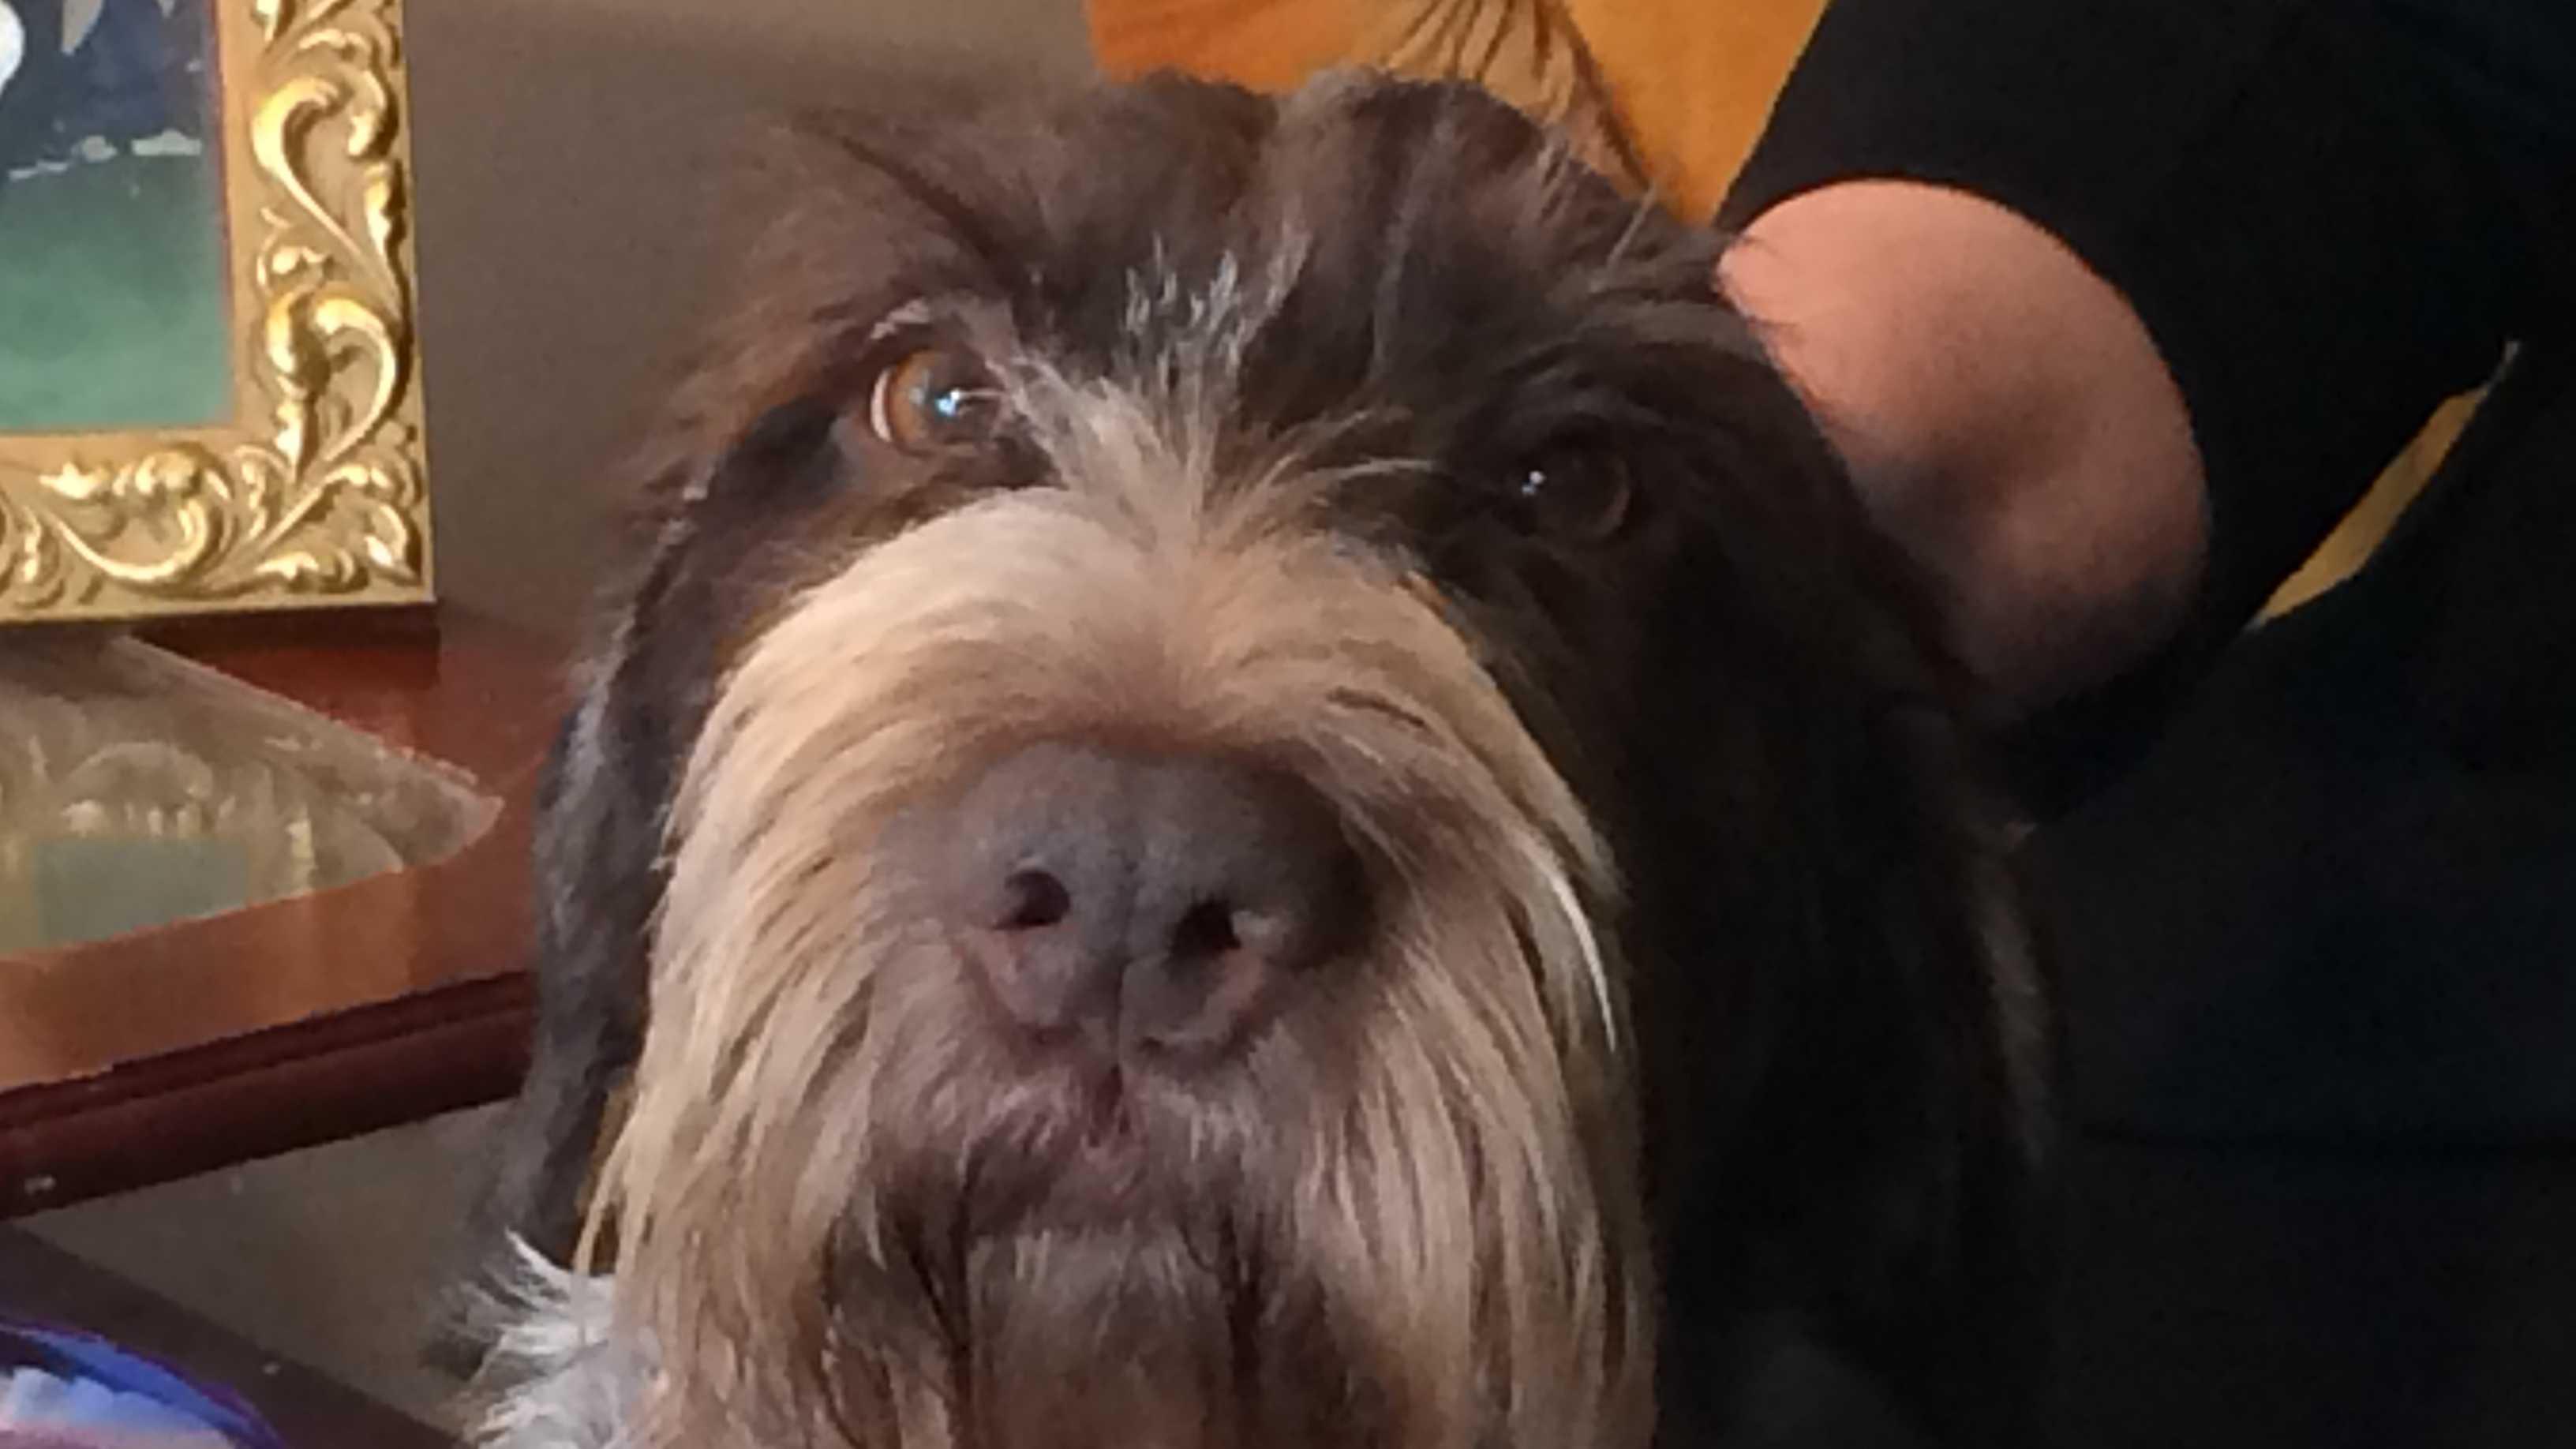 Sookie the dog